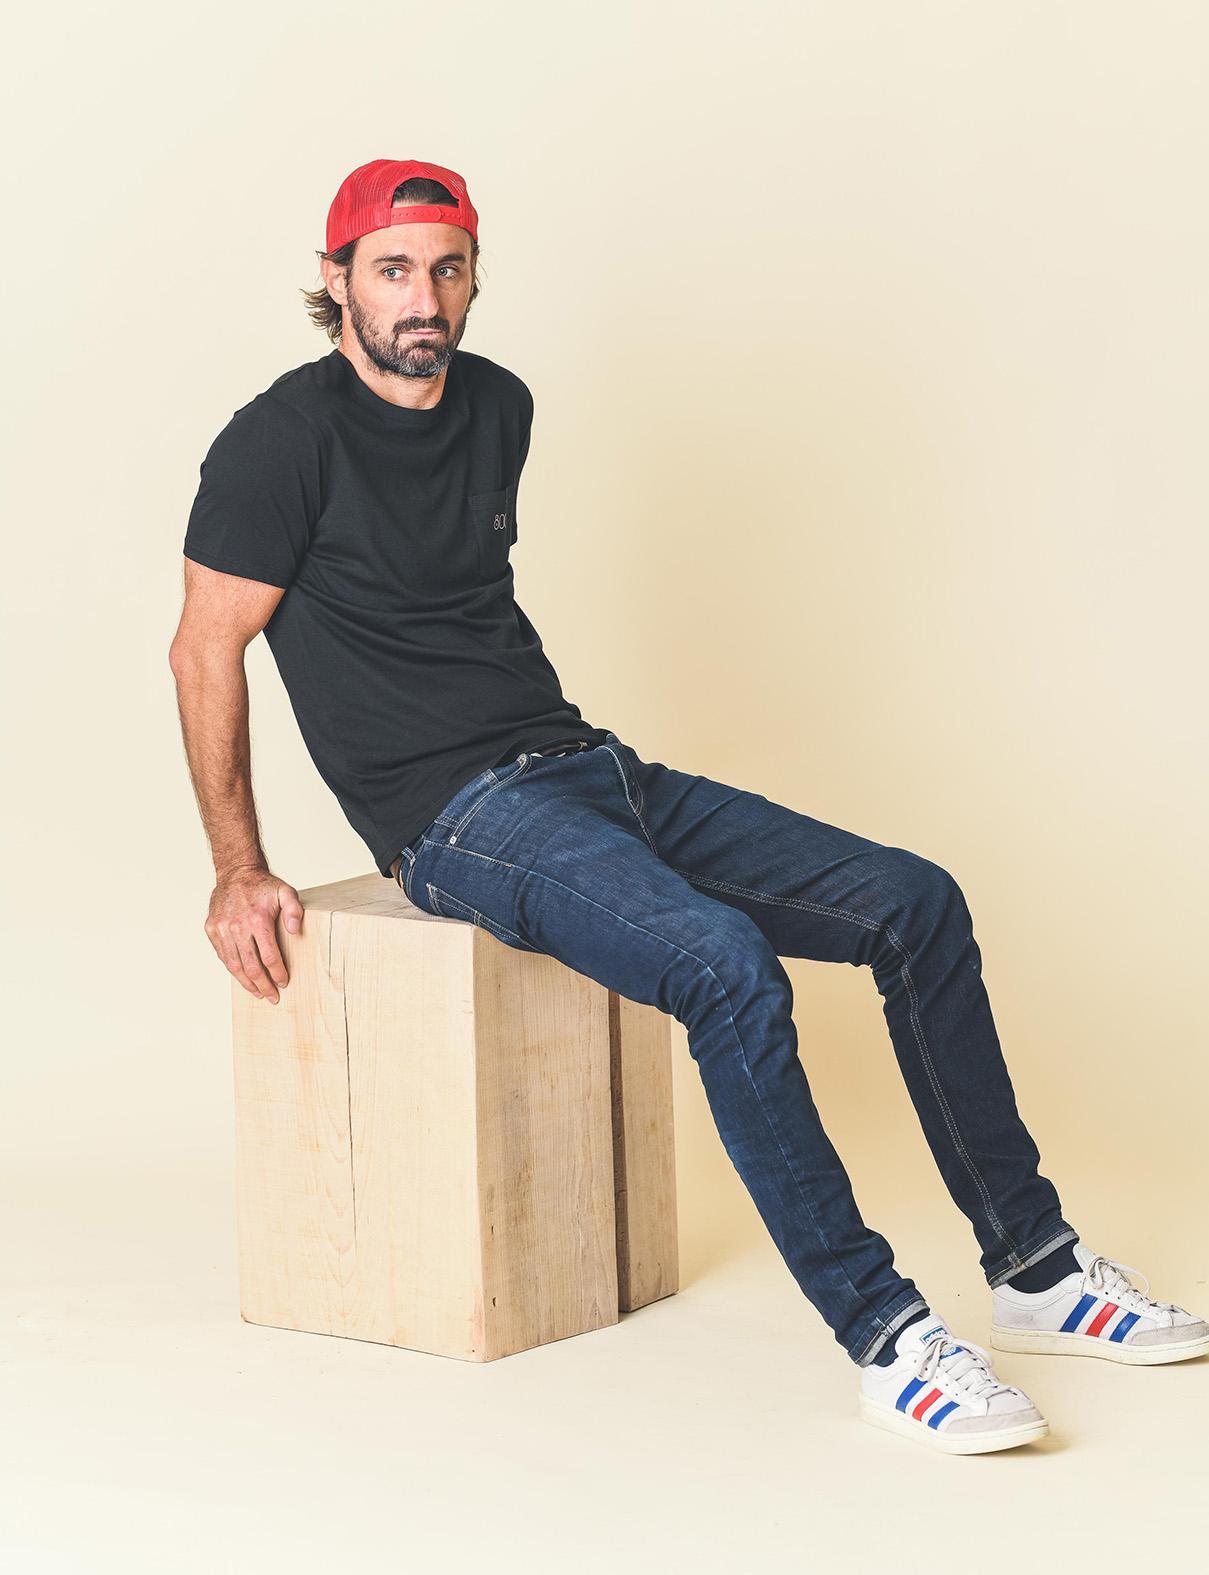 Laurent-scavone-photographe-mode-studio-lille-165-1